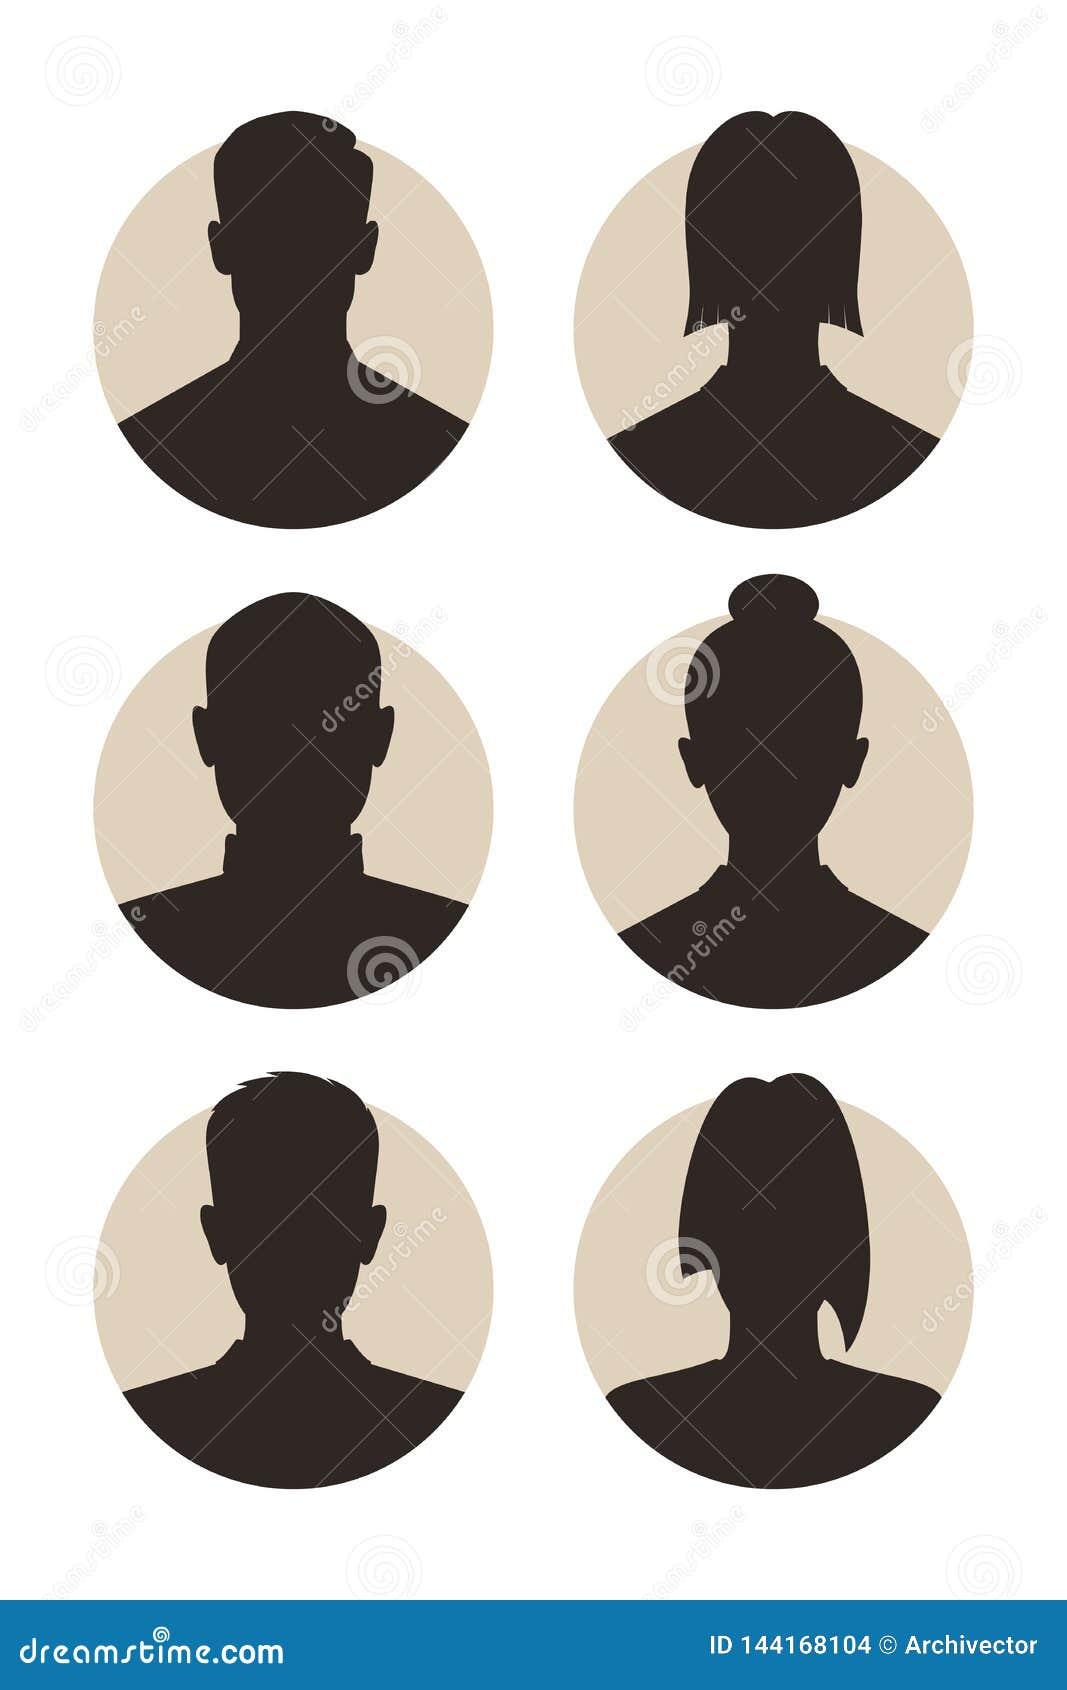 Avatars abstract people